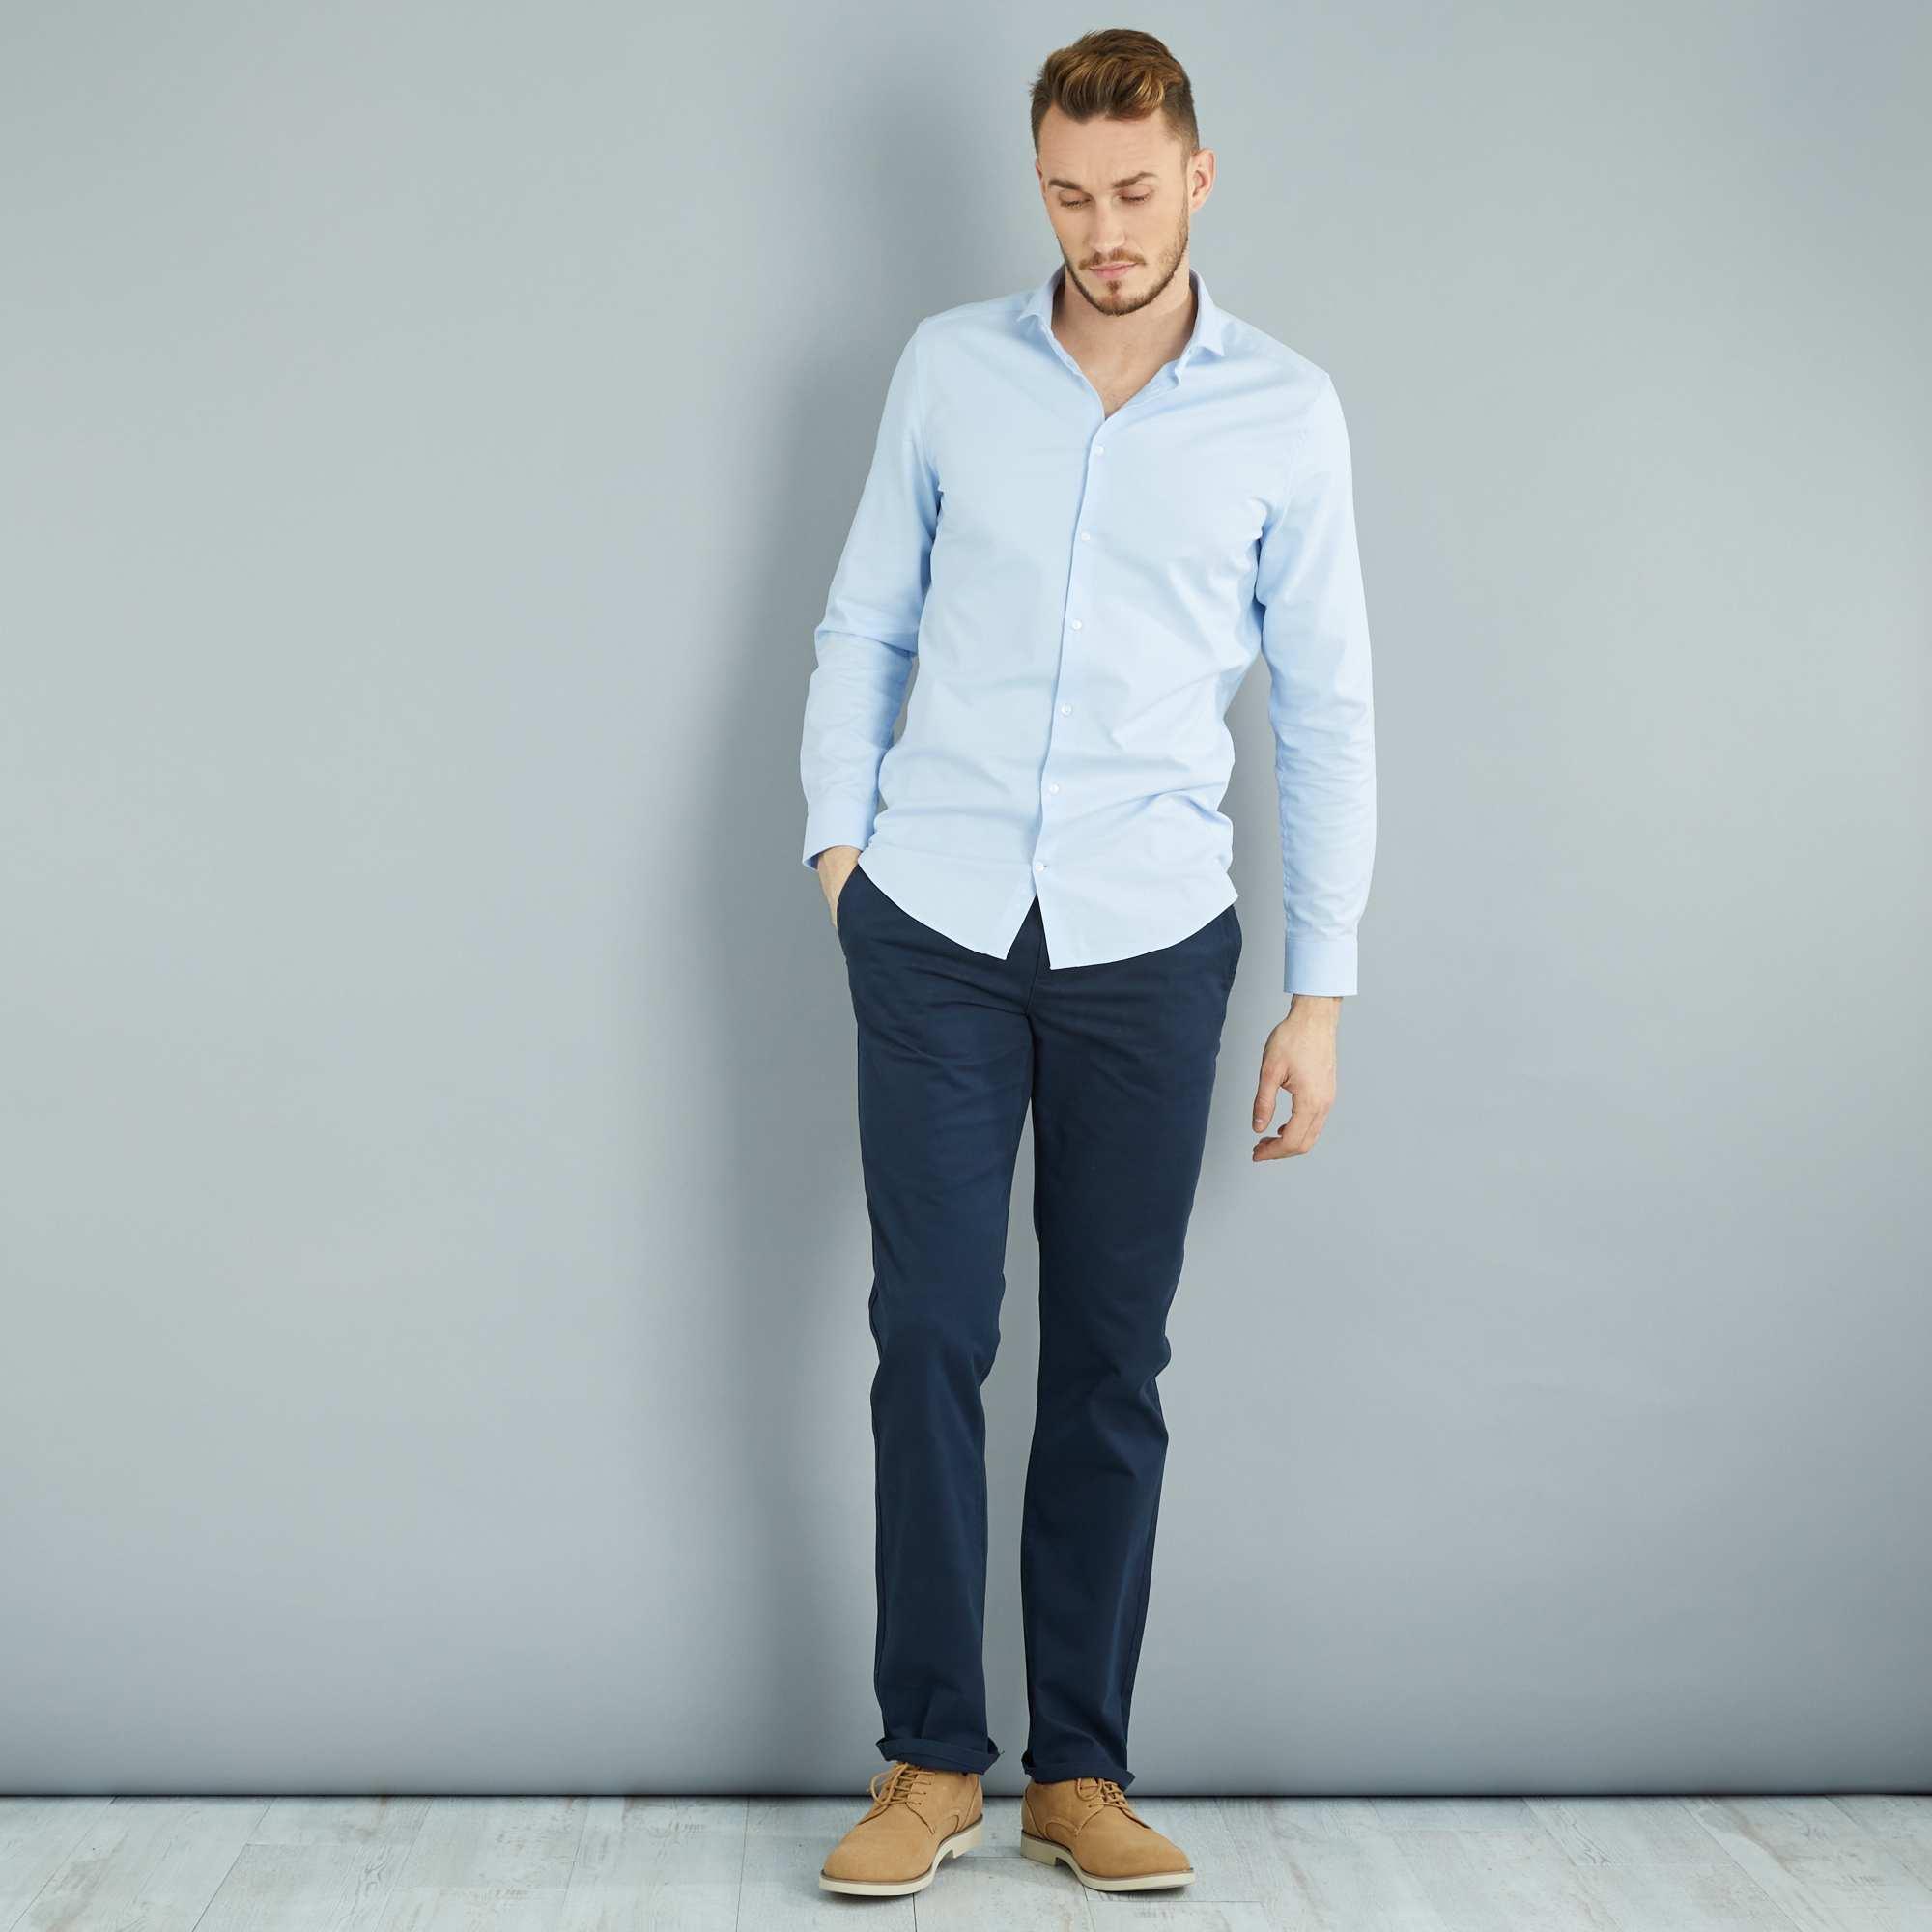 pantalon chino regular pur coton l36 1m90 homme bleu. Black Bedroom Furniture Sets. Home Design Ideas